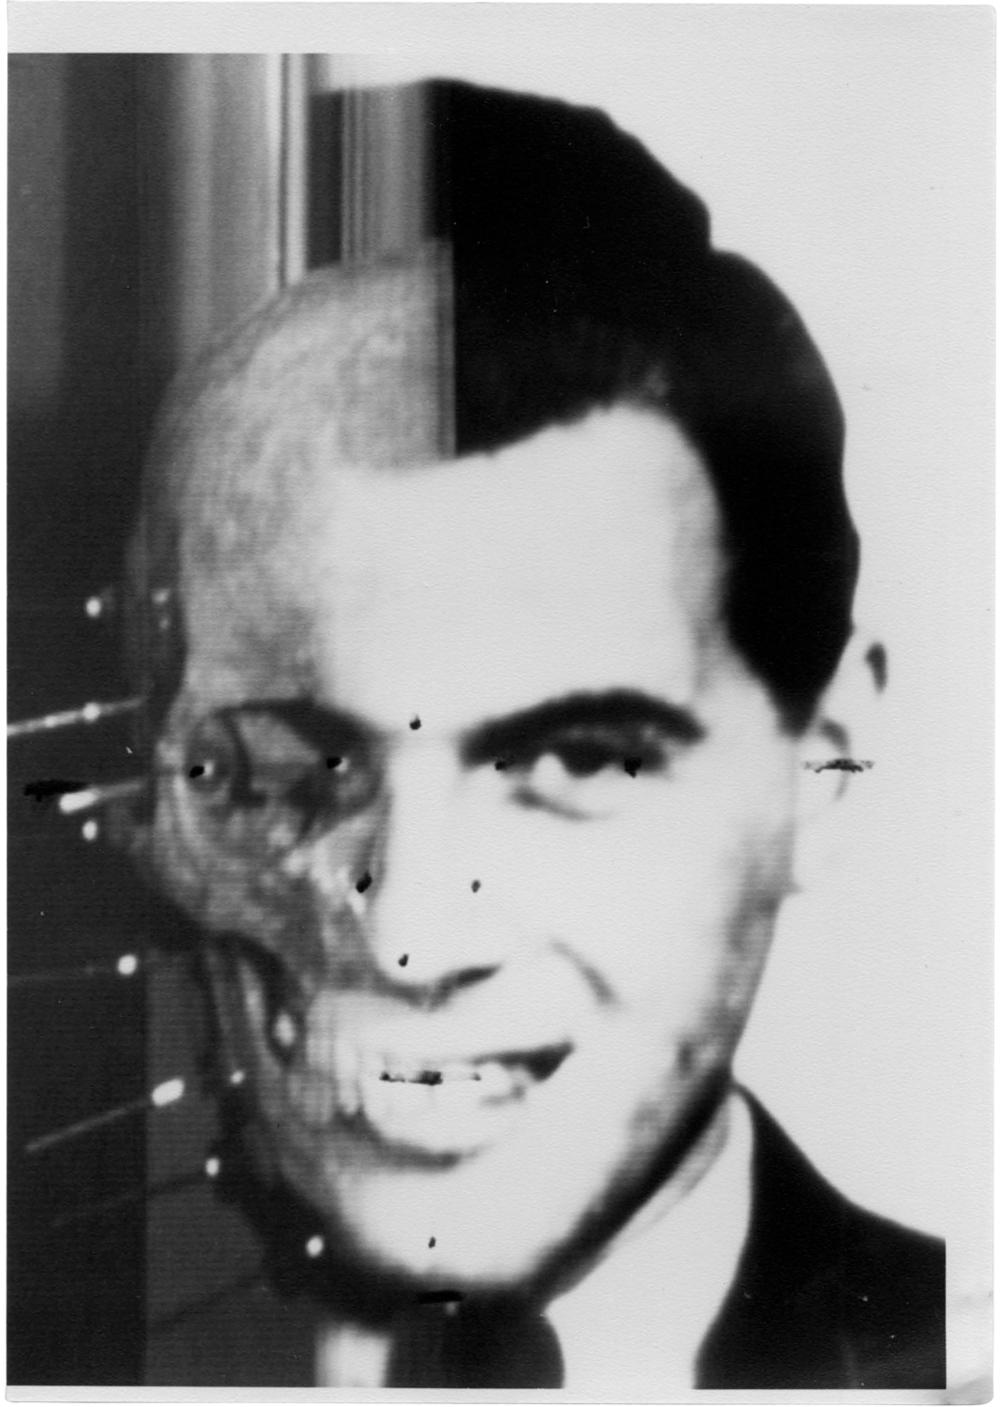 Josef+Mengele's+Skull.png